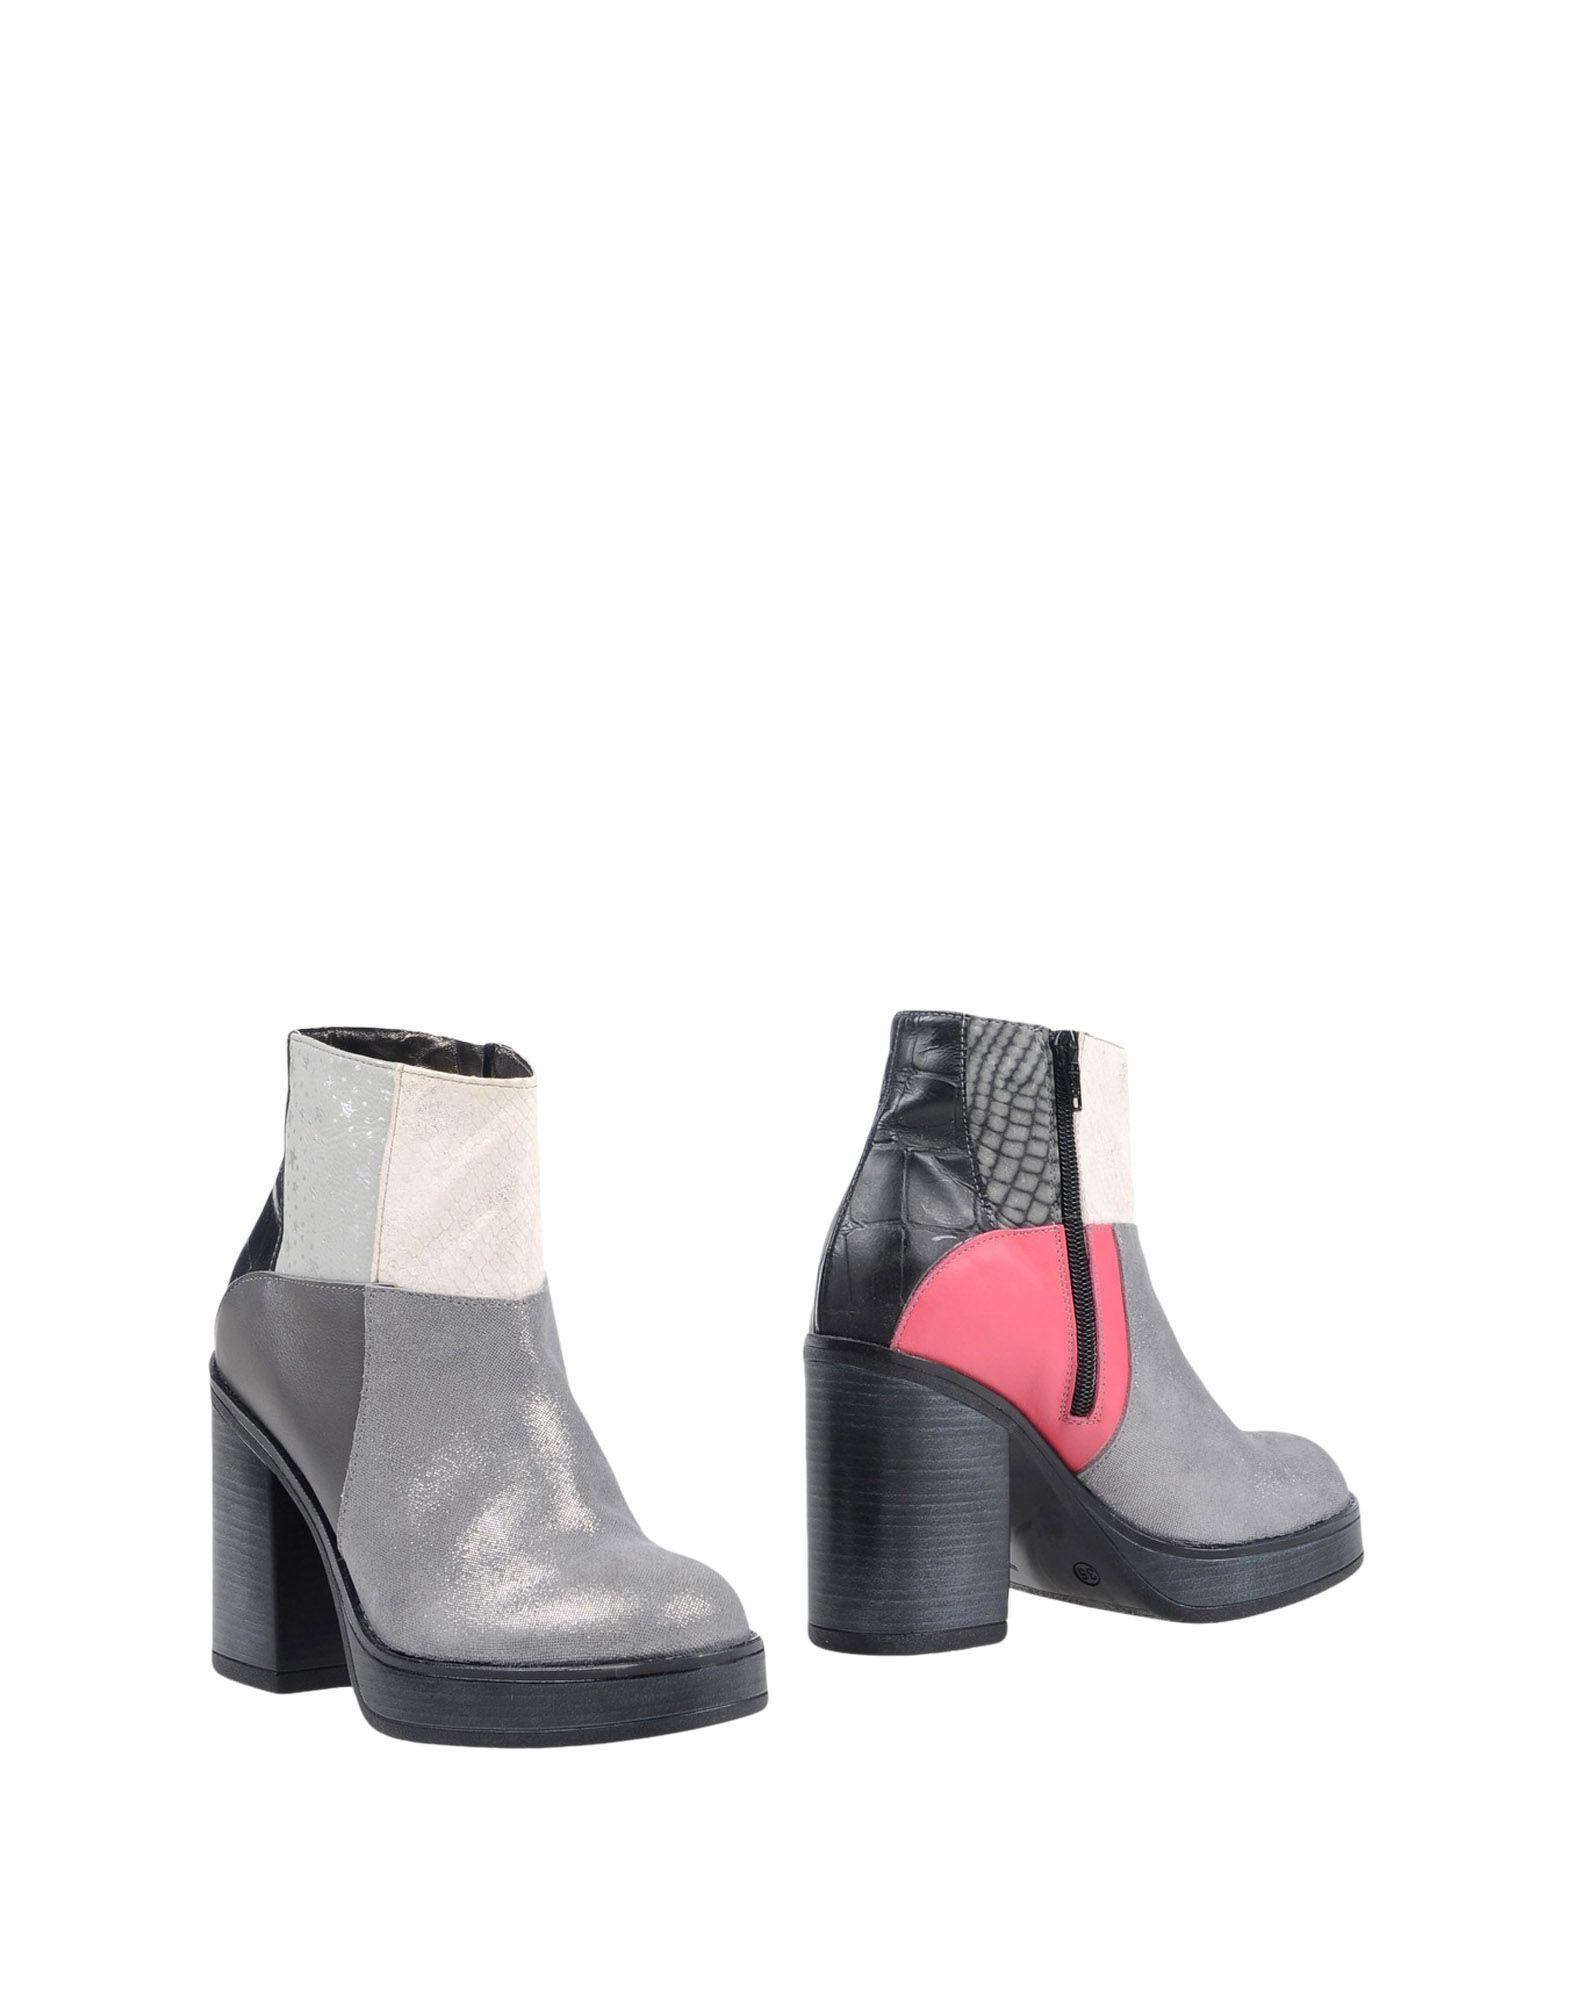 Moda Stivaletti Ebarrito Donna - 11458010SV